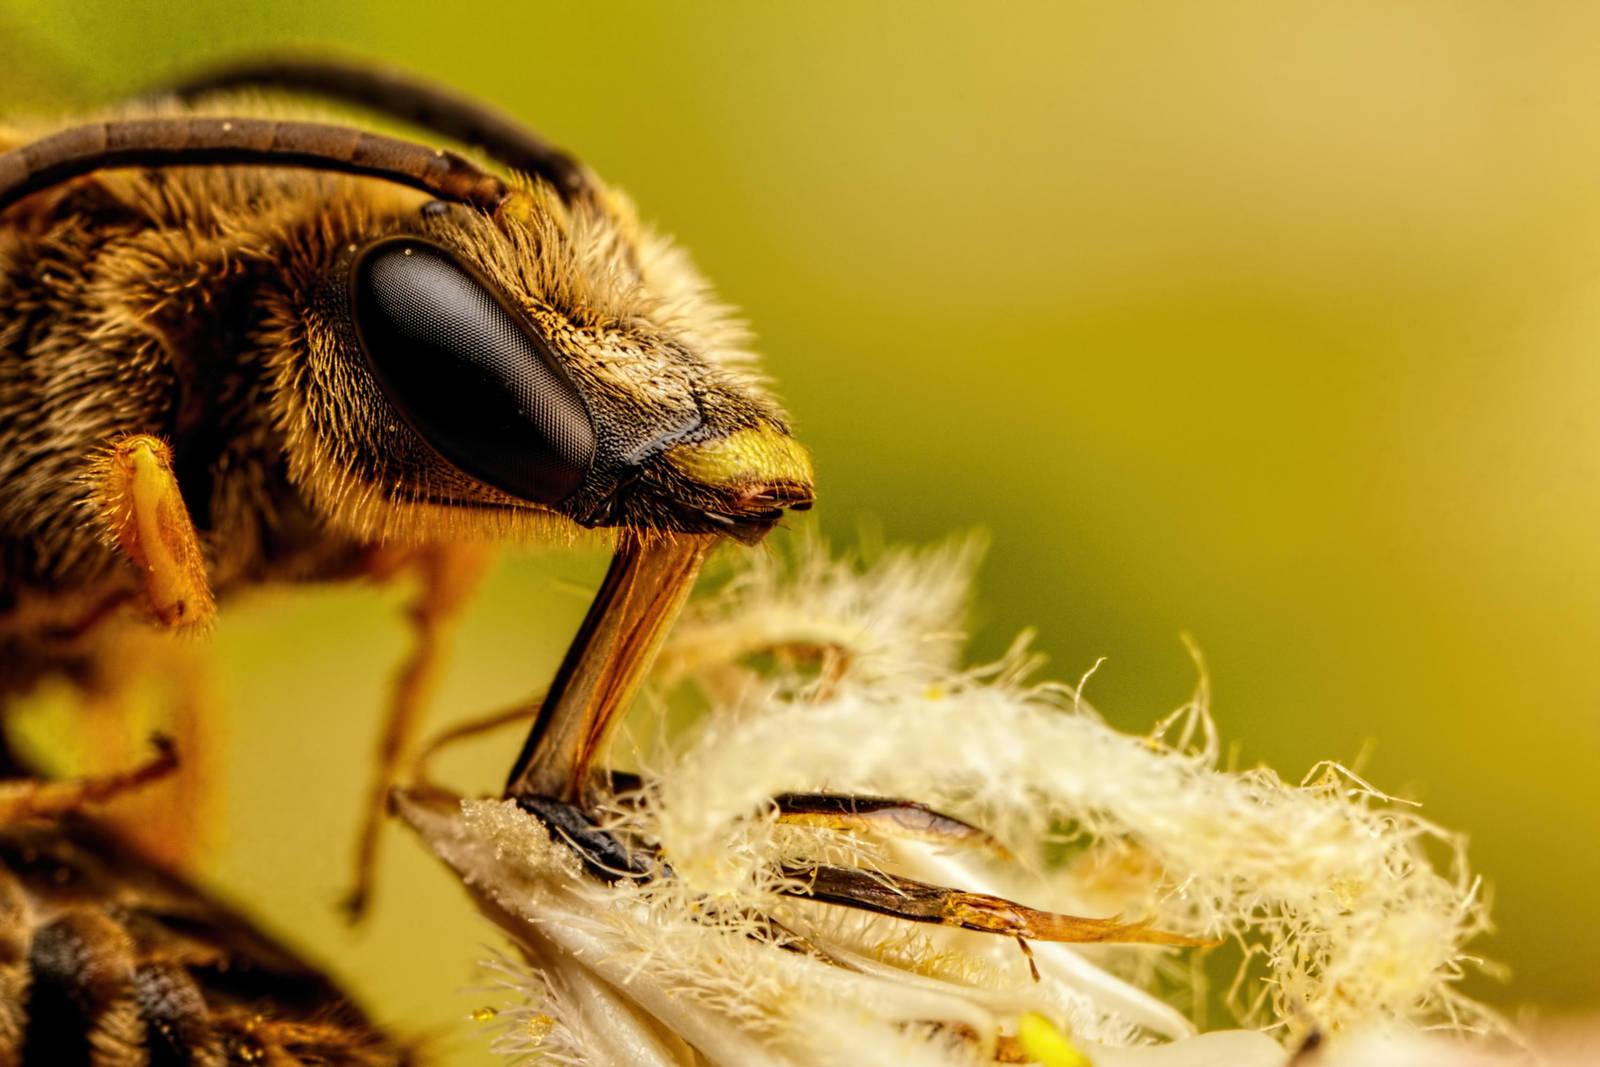 Sleeping Solitary Bee II by dalantech